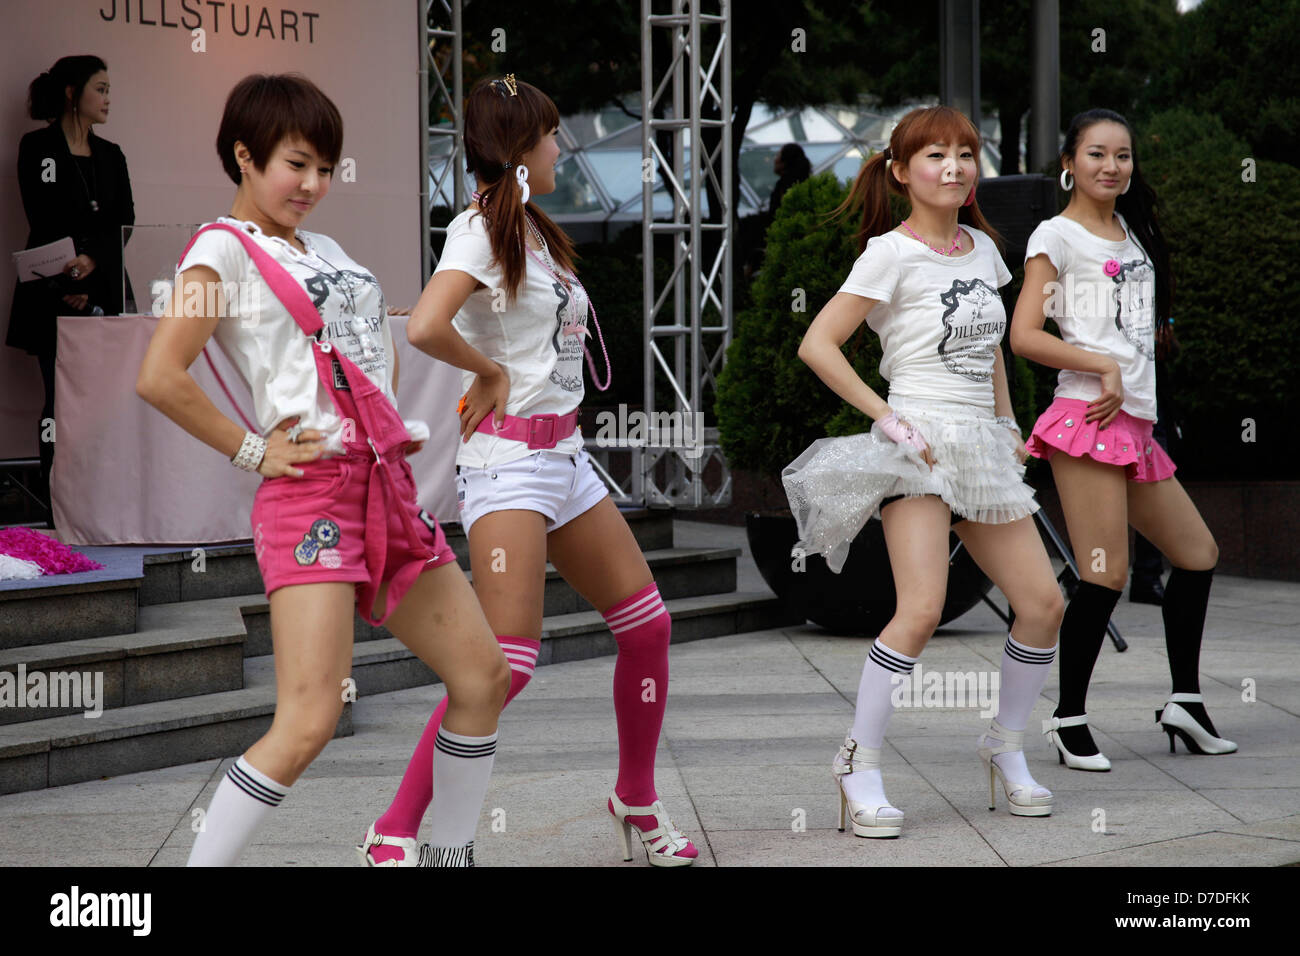 FKK - Rochelle -nudistenwelt.net korean girls dancing during a Jill Stuart fahion show in Seoul, South  Korea, Asia